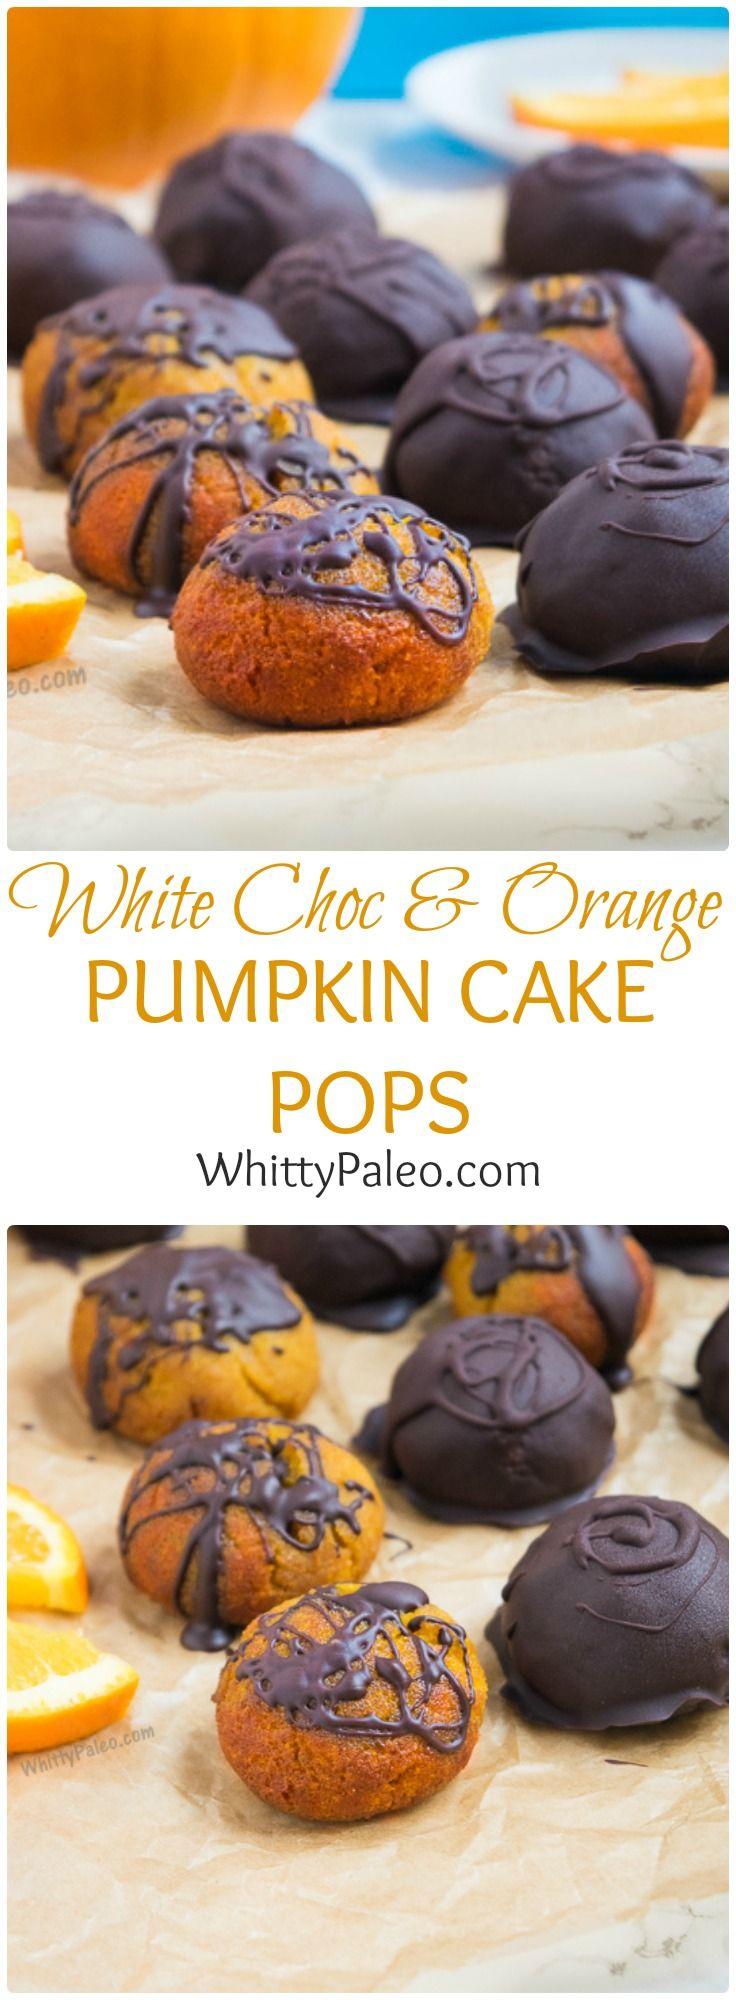 Paleo White Chocolate Orange Pumpkin Cake Pops – completely gluten free, grain free. Paleo pumpkin cake pops infused with paleo white chocolate and orange and covered in a dark chocolate. A delicious fall treat.